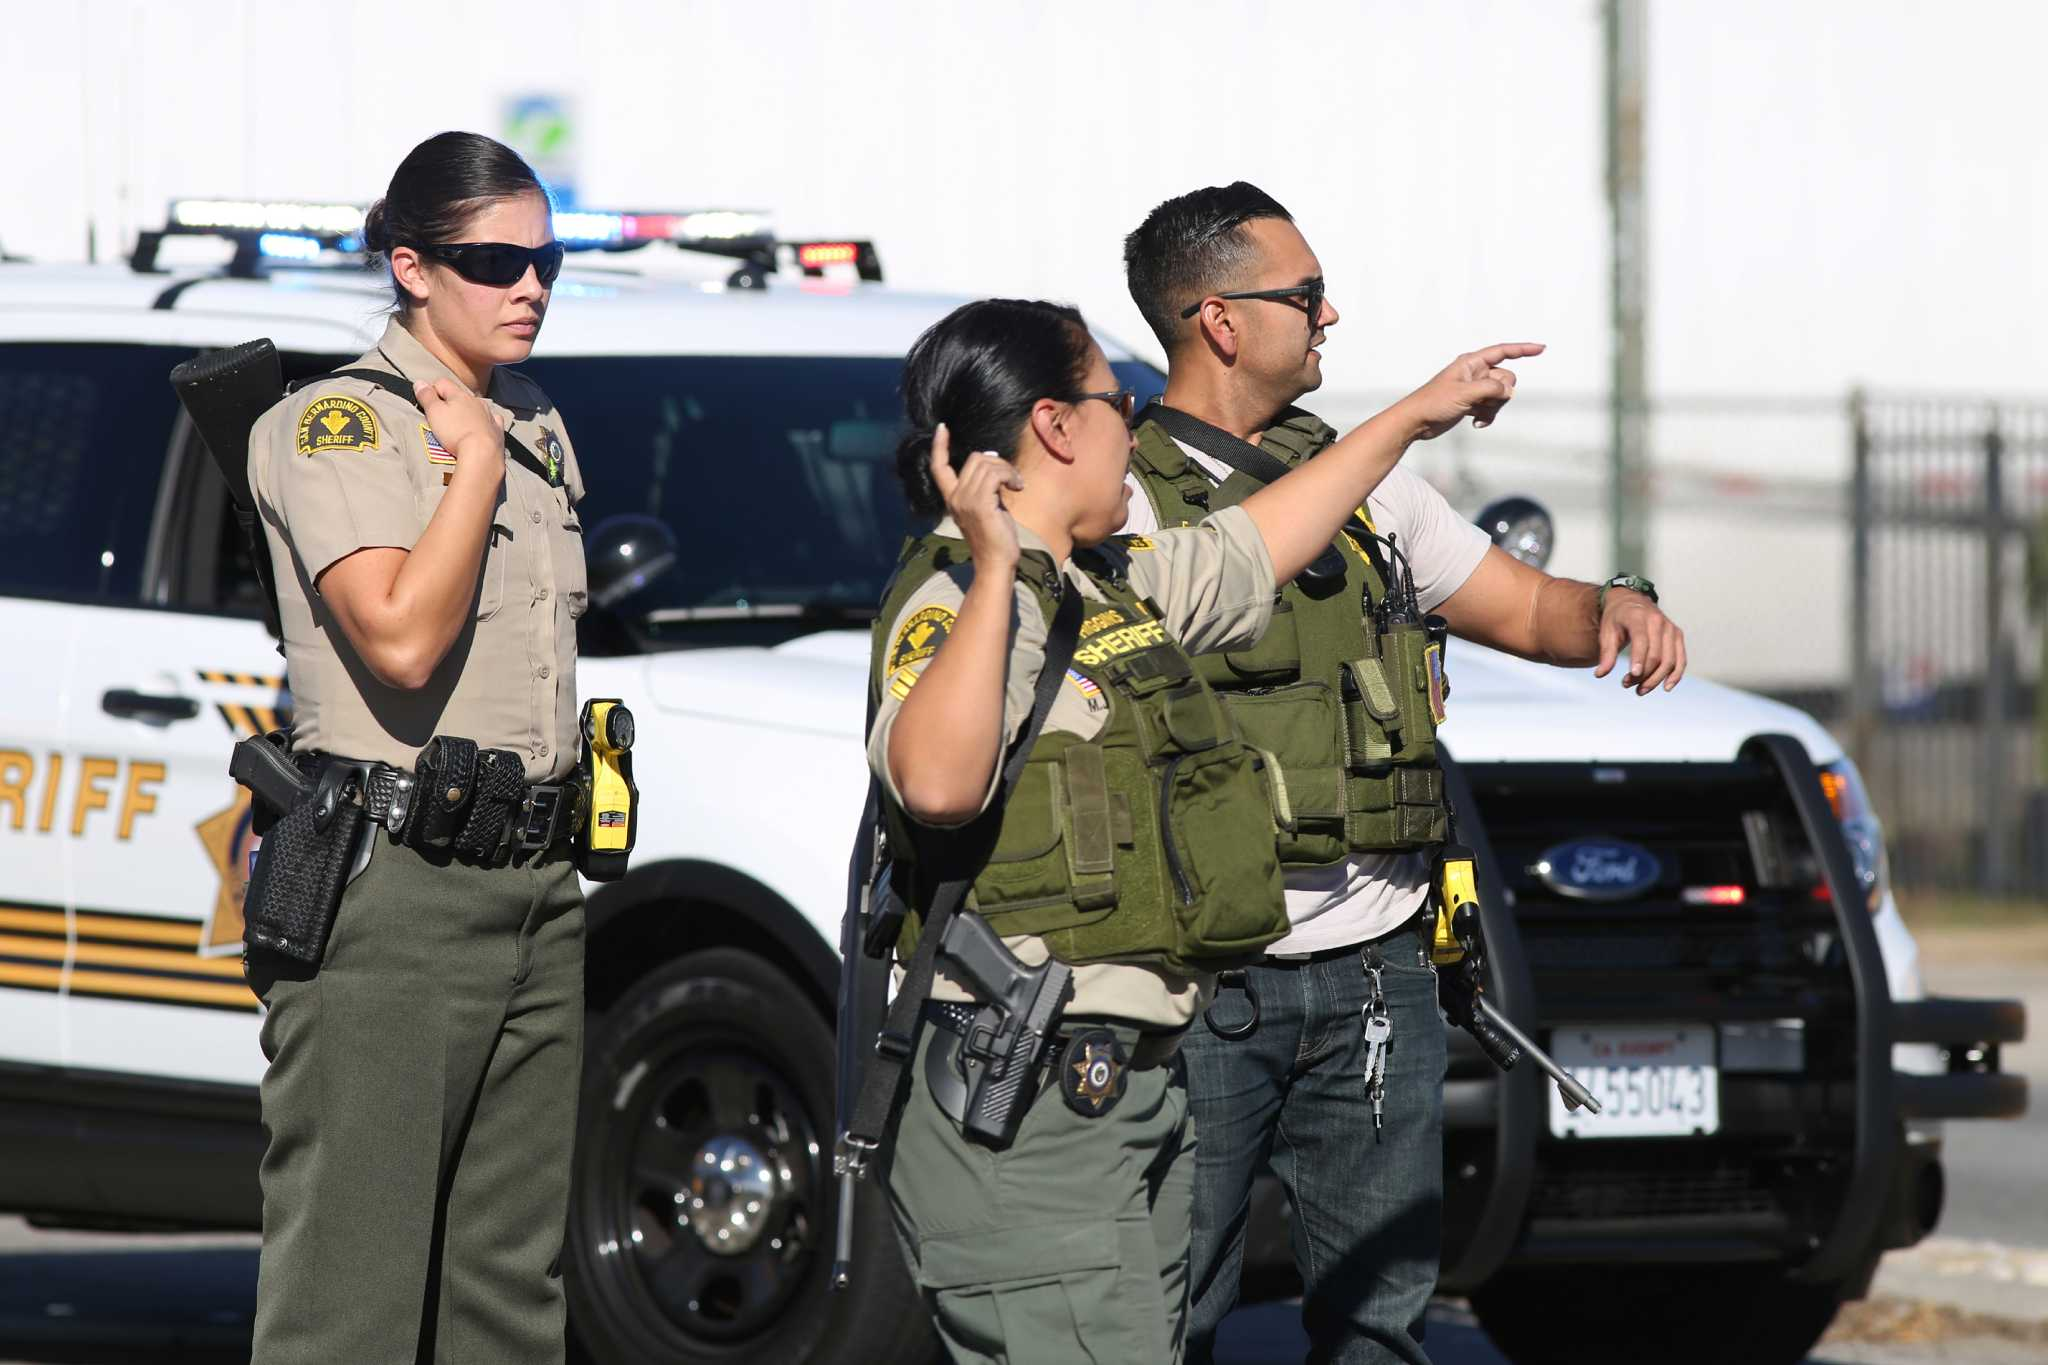 Gay shooting in california